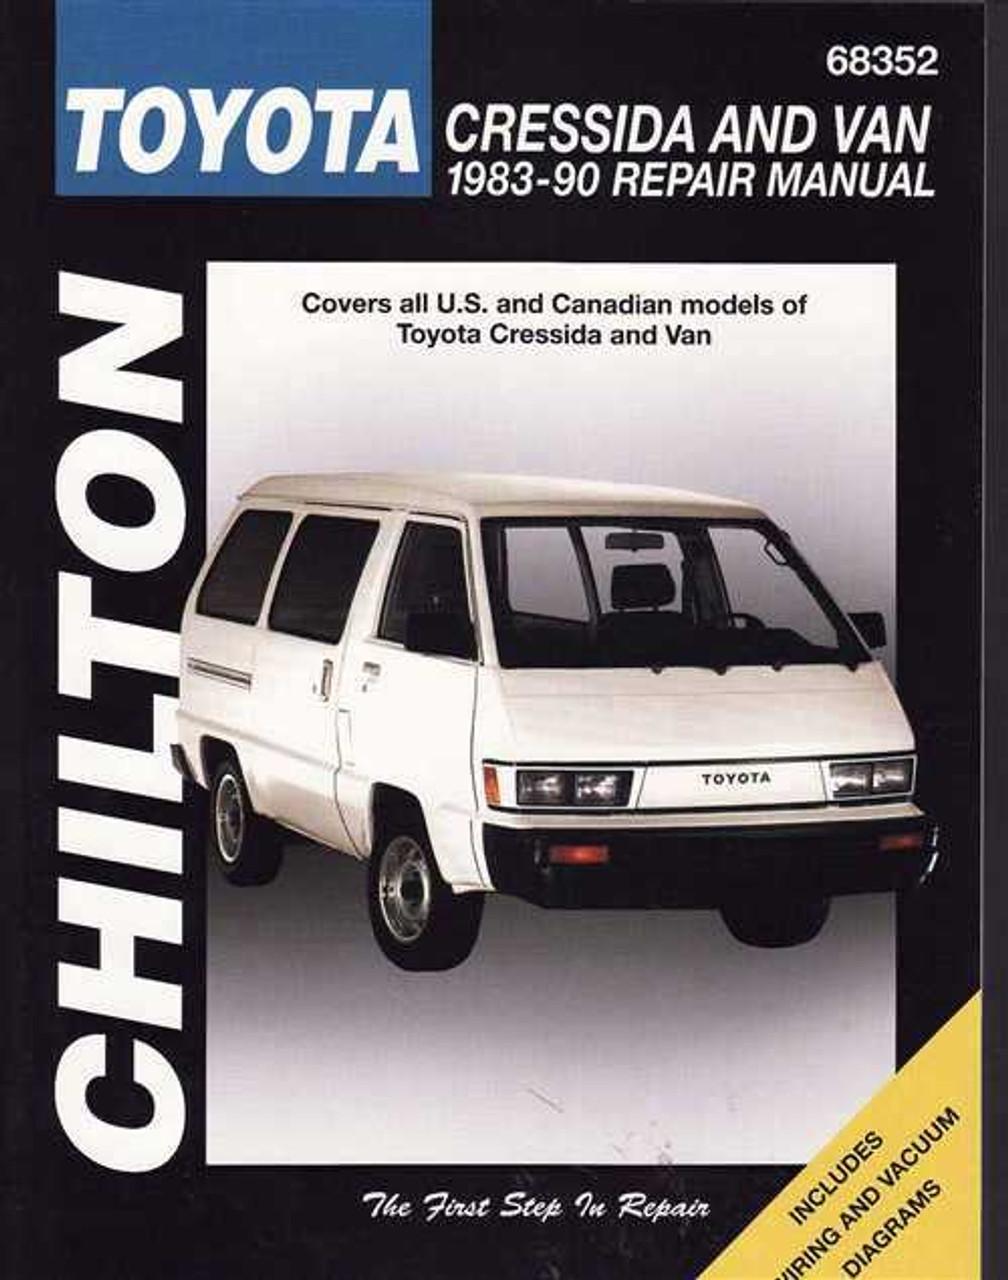 toyota cressida and van 1983 1990 workshop manual rh automotobookshop com au 1991 toyota cressida manual transmission 1992 Toyota Cressida